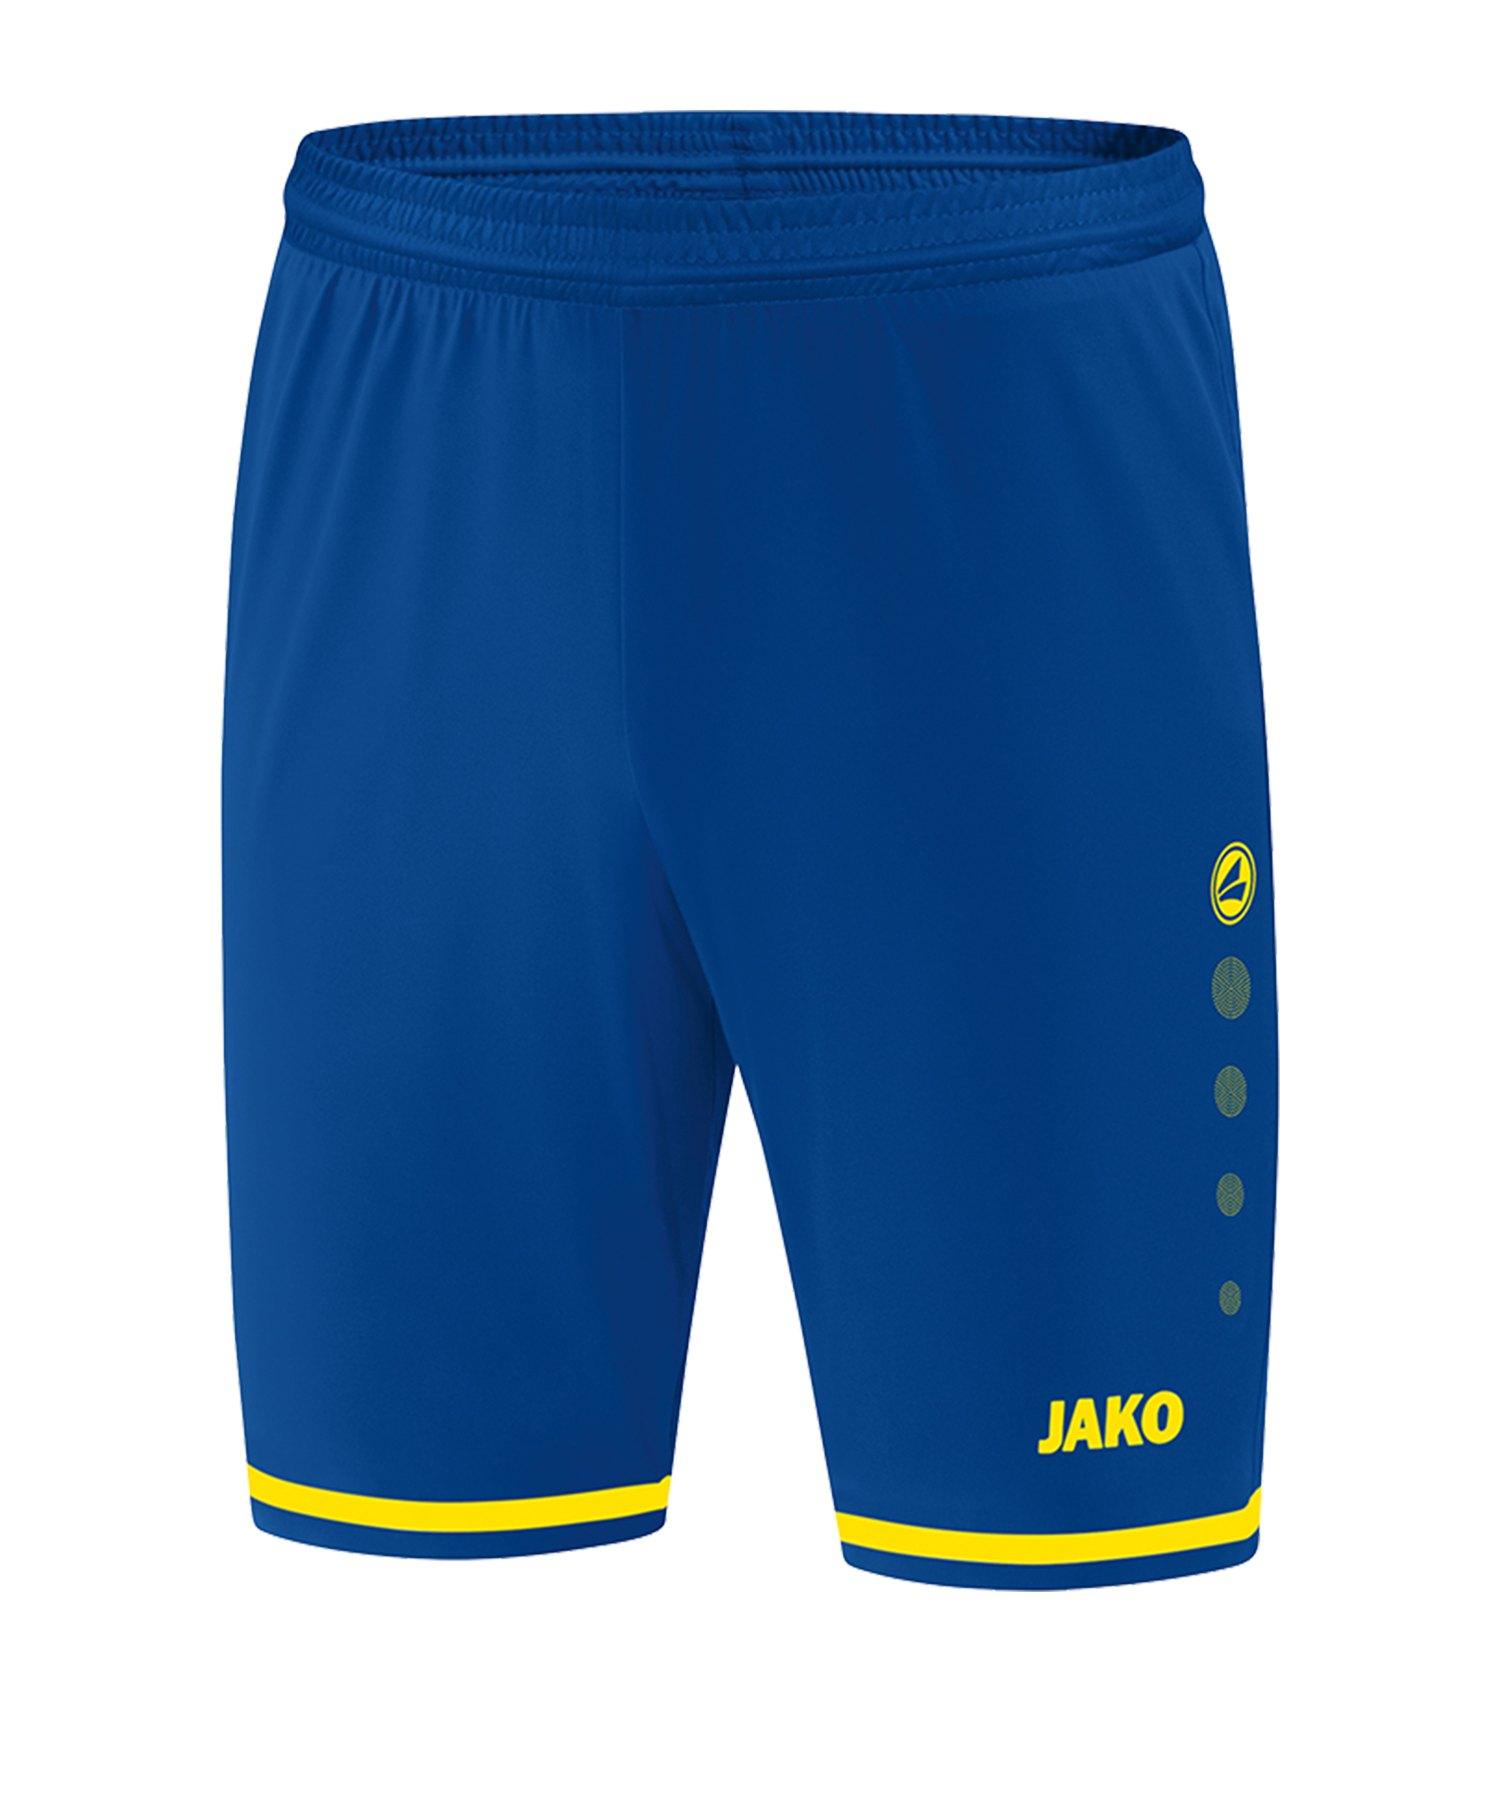 Jako Striker 2.0 Short Hose kurz Blau Gelb F12 - Blau